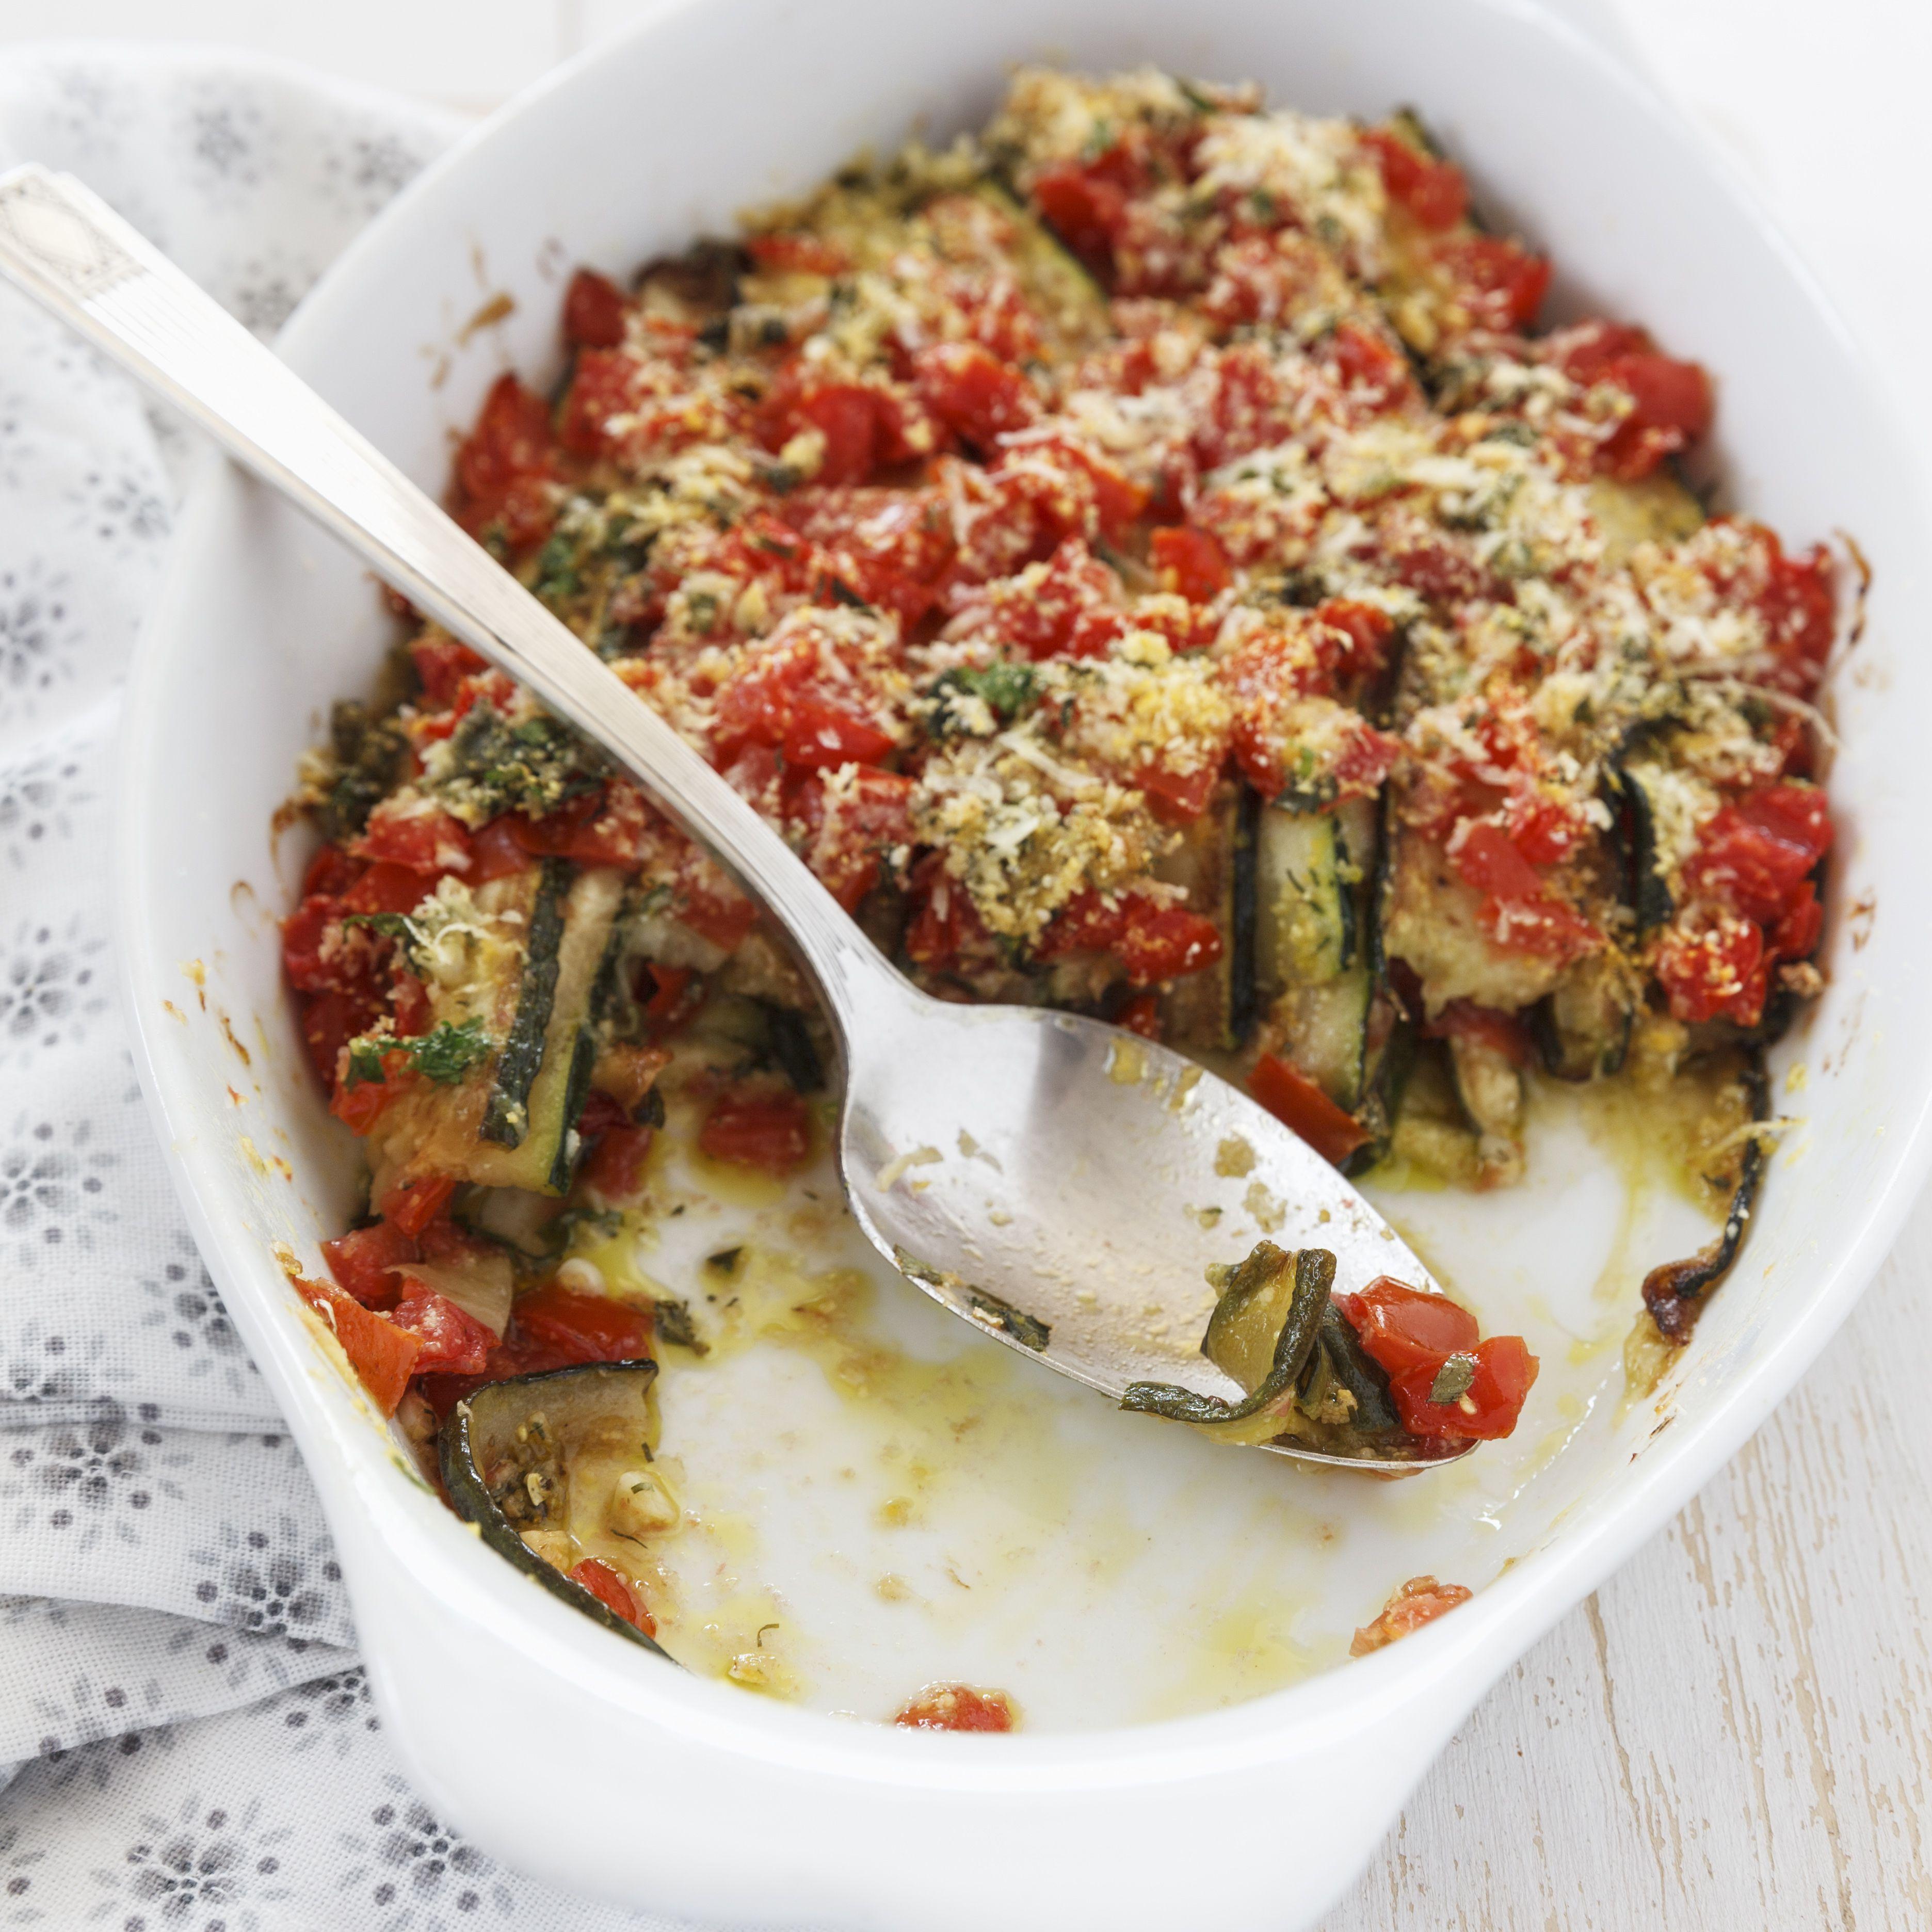 Zucchini Tomato Gratin in gratin dish